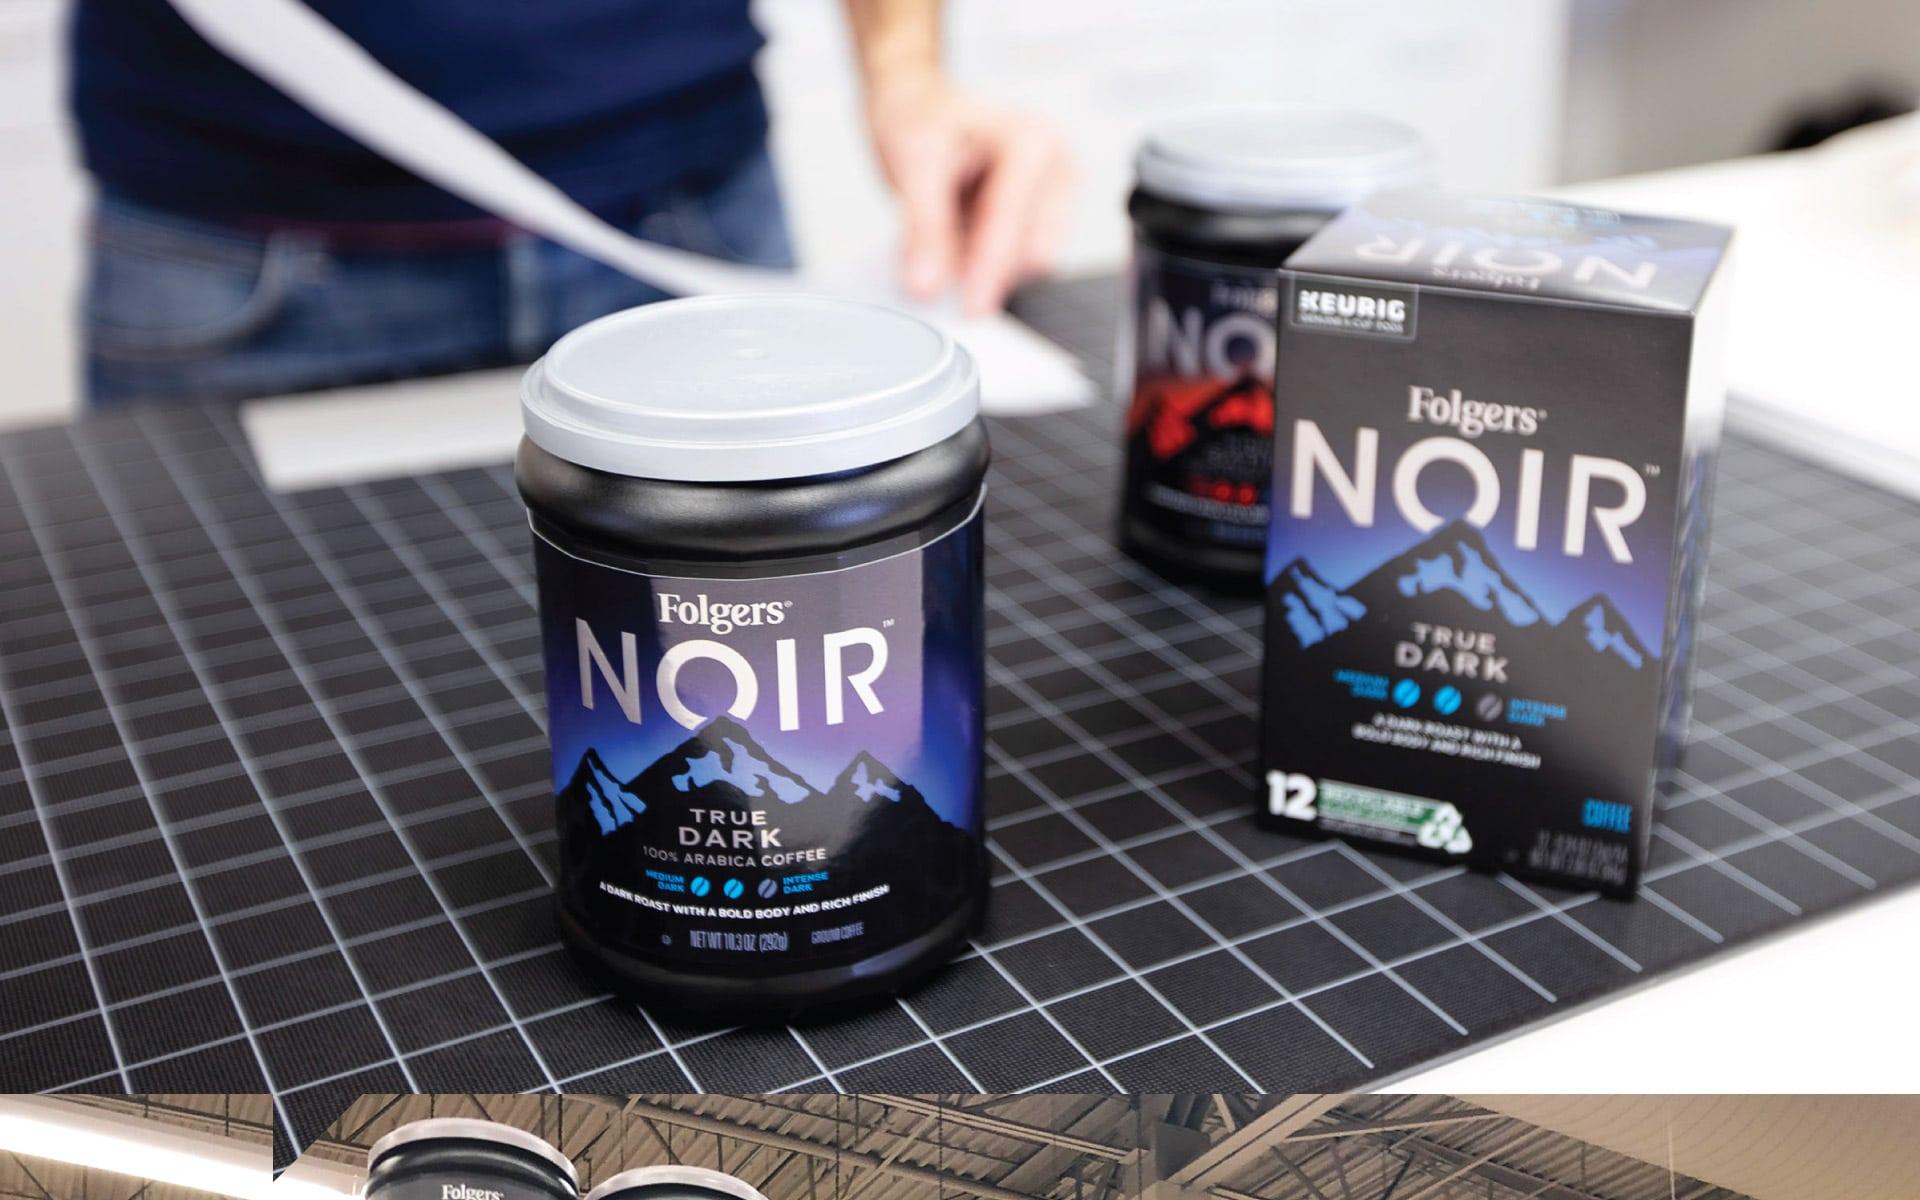 Folgers Noir - Packaging Mock-ups